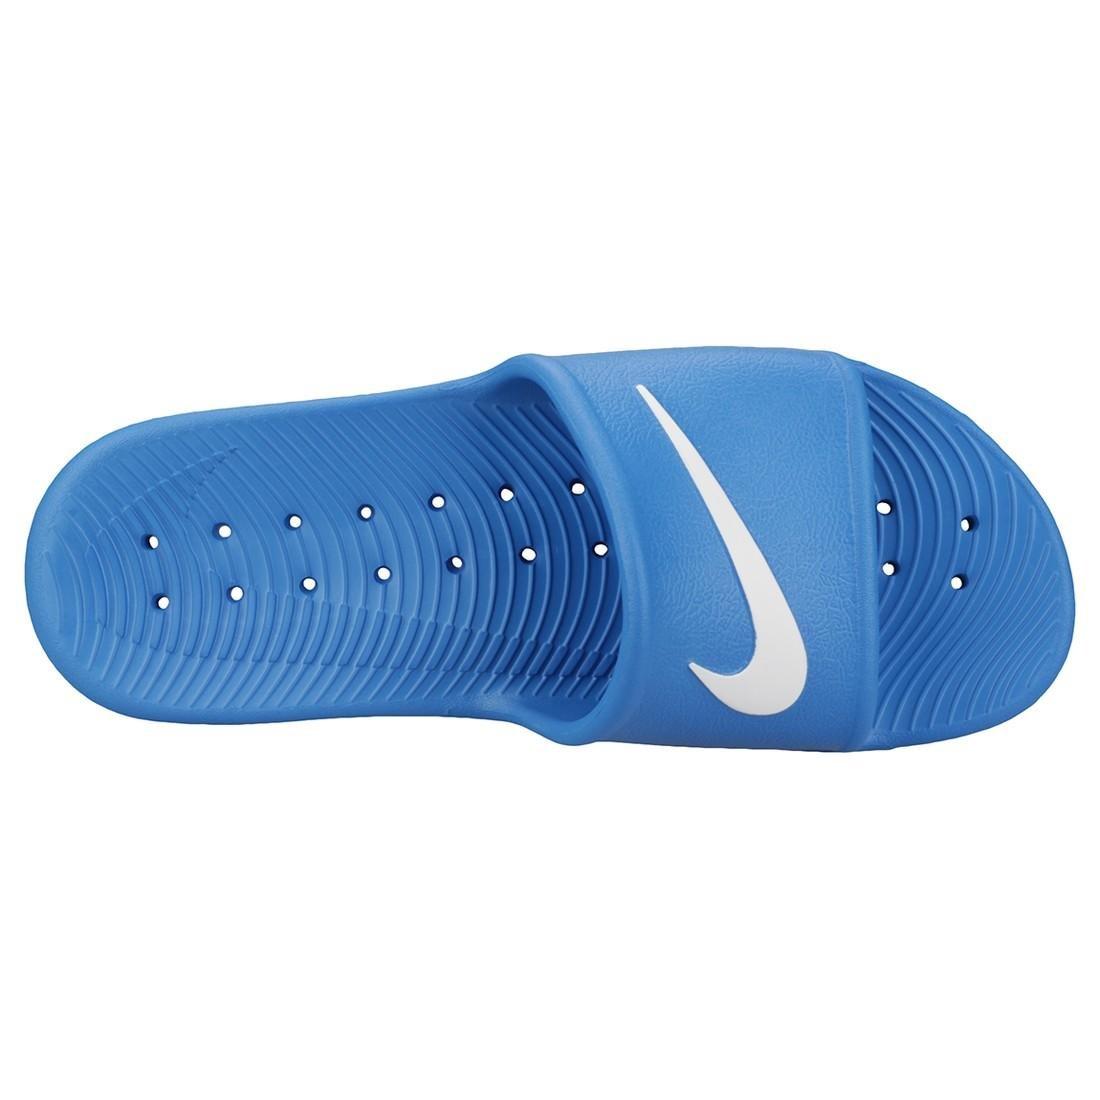 premium selection 93fdb 2ed34 Nike 832528-410, Baskets Mode pour Homme Bleu Bleu - Bleu - Bleu, 42.5 EU:  Amazon.fr: Chaussures et Sacs